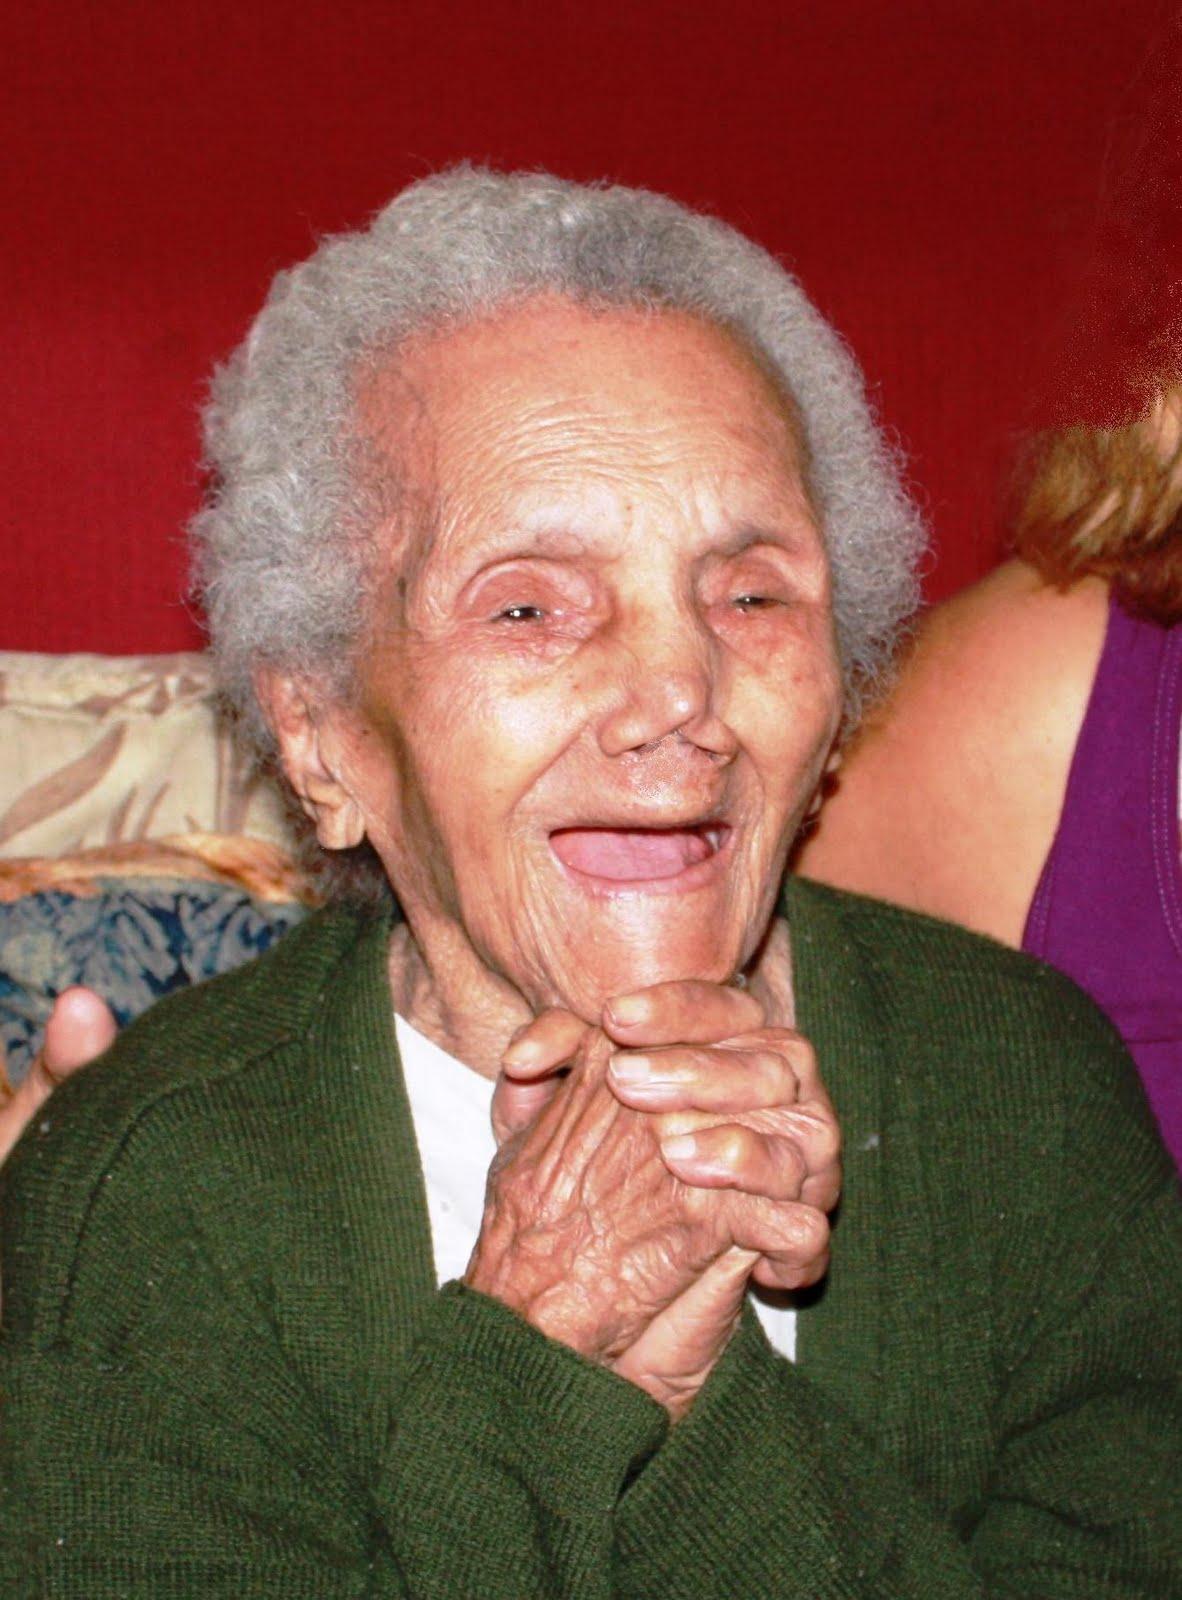 http://3.bp.blogspot.com/_XPBViUhNthA/TE9TWz6S71I/AAAAAAAAAEI/-9mrMLbTdkM/s1600/Maria+Rosa+110+anos.jpg